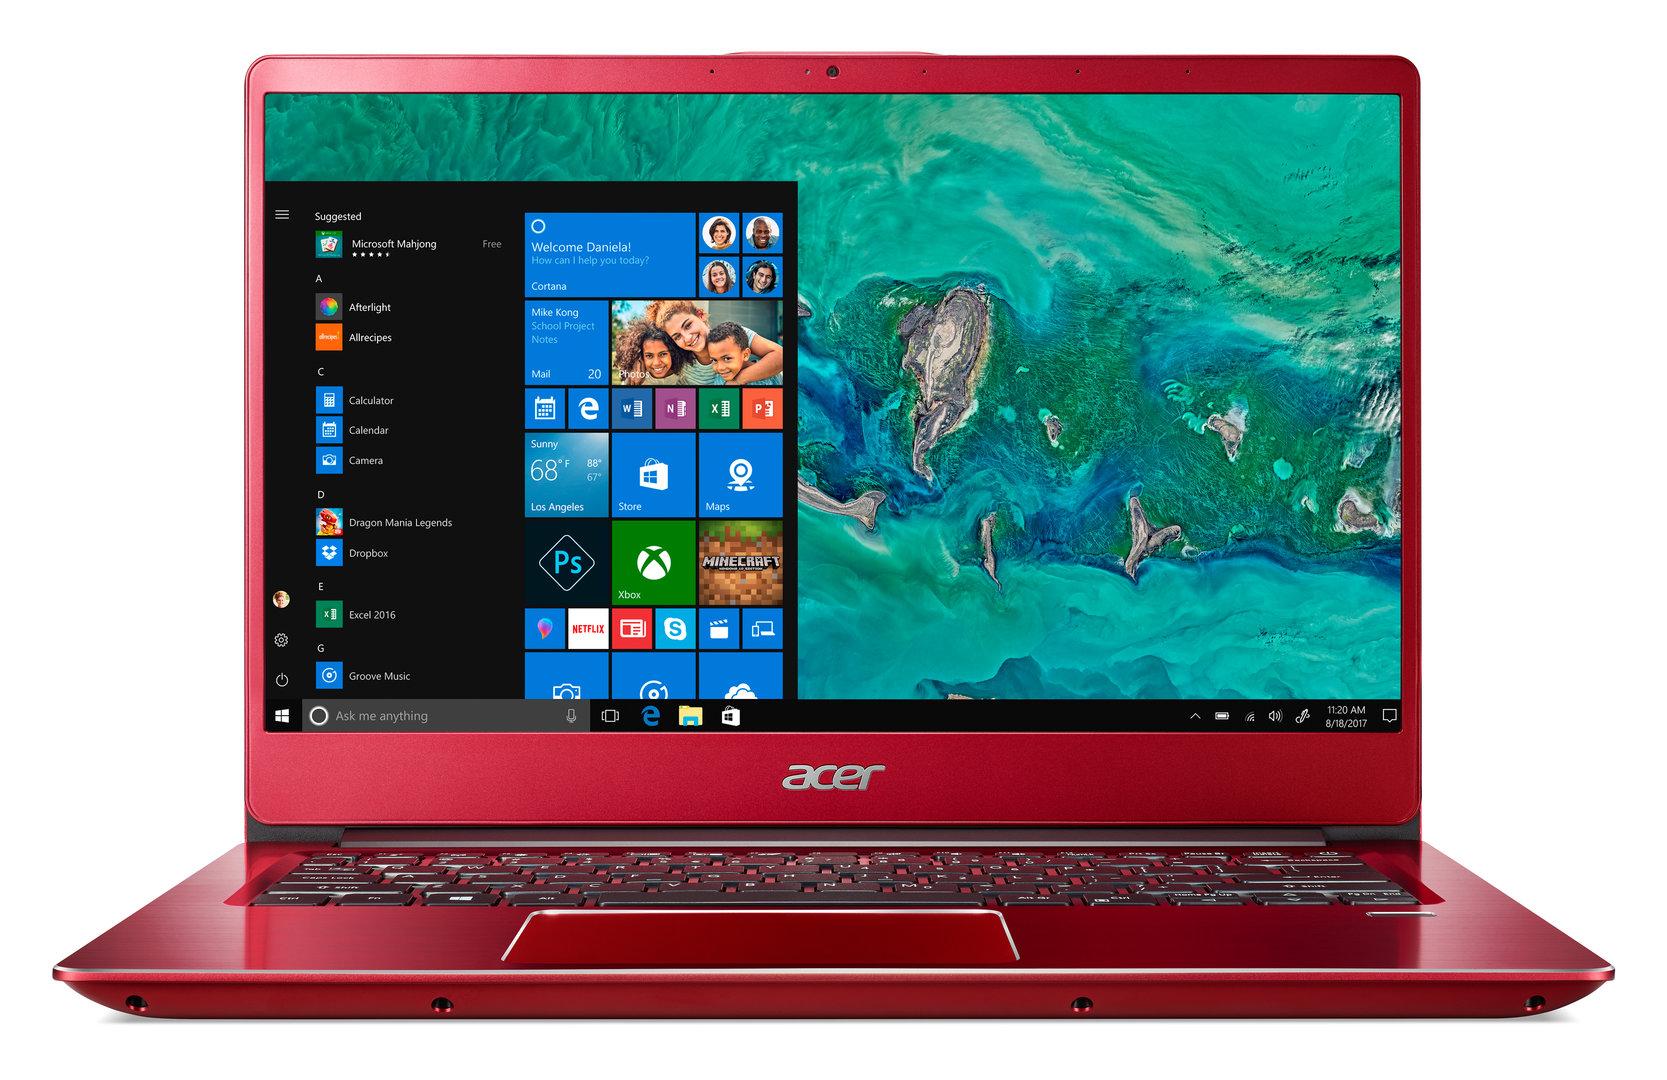 Acer Swift 3 (2018) (14 Zoll) (Rot)